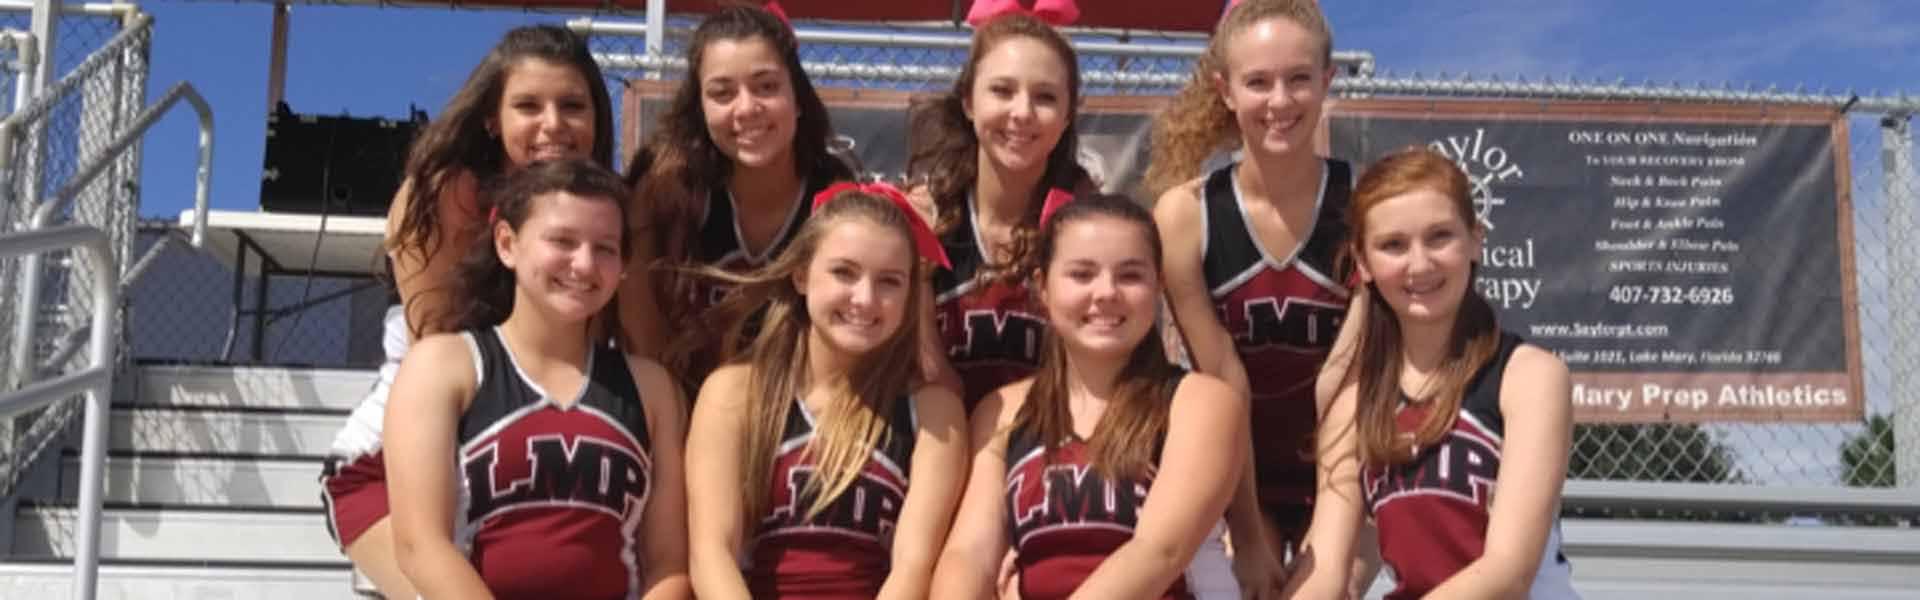 Lakemary-highschool-FL-Squad-Main-BAnner